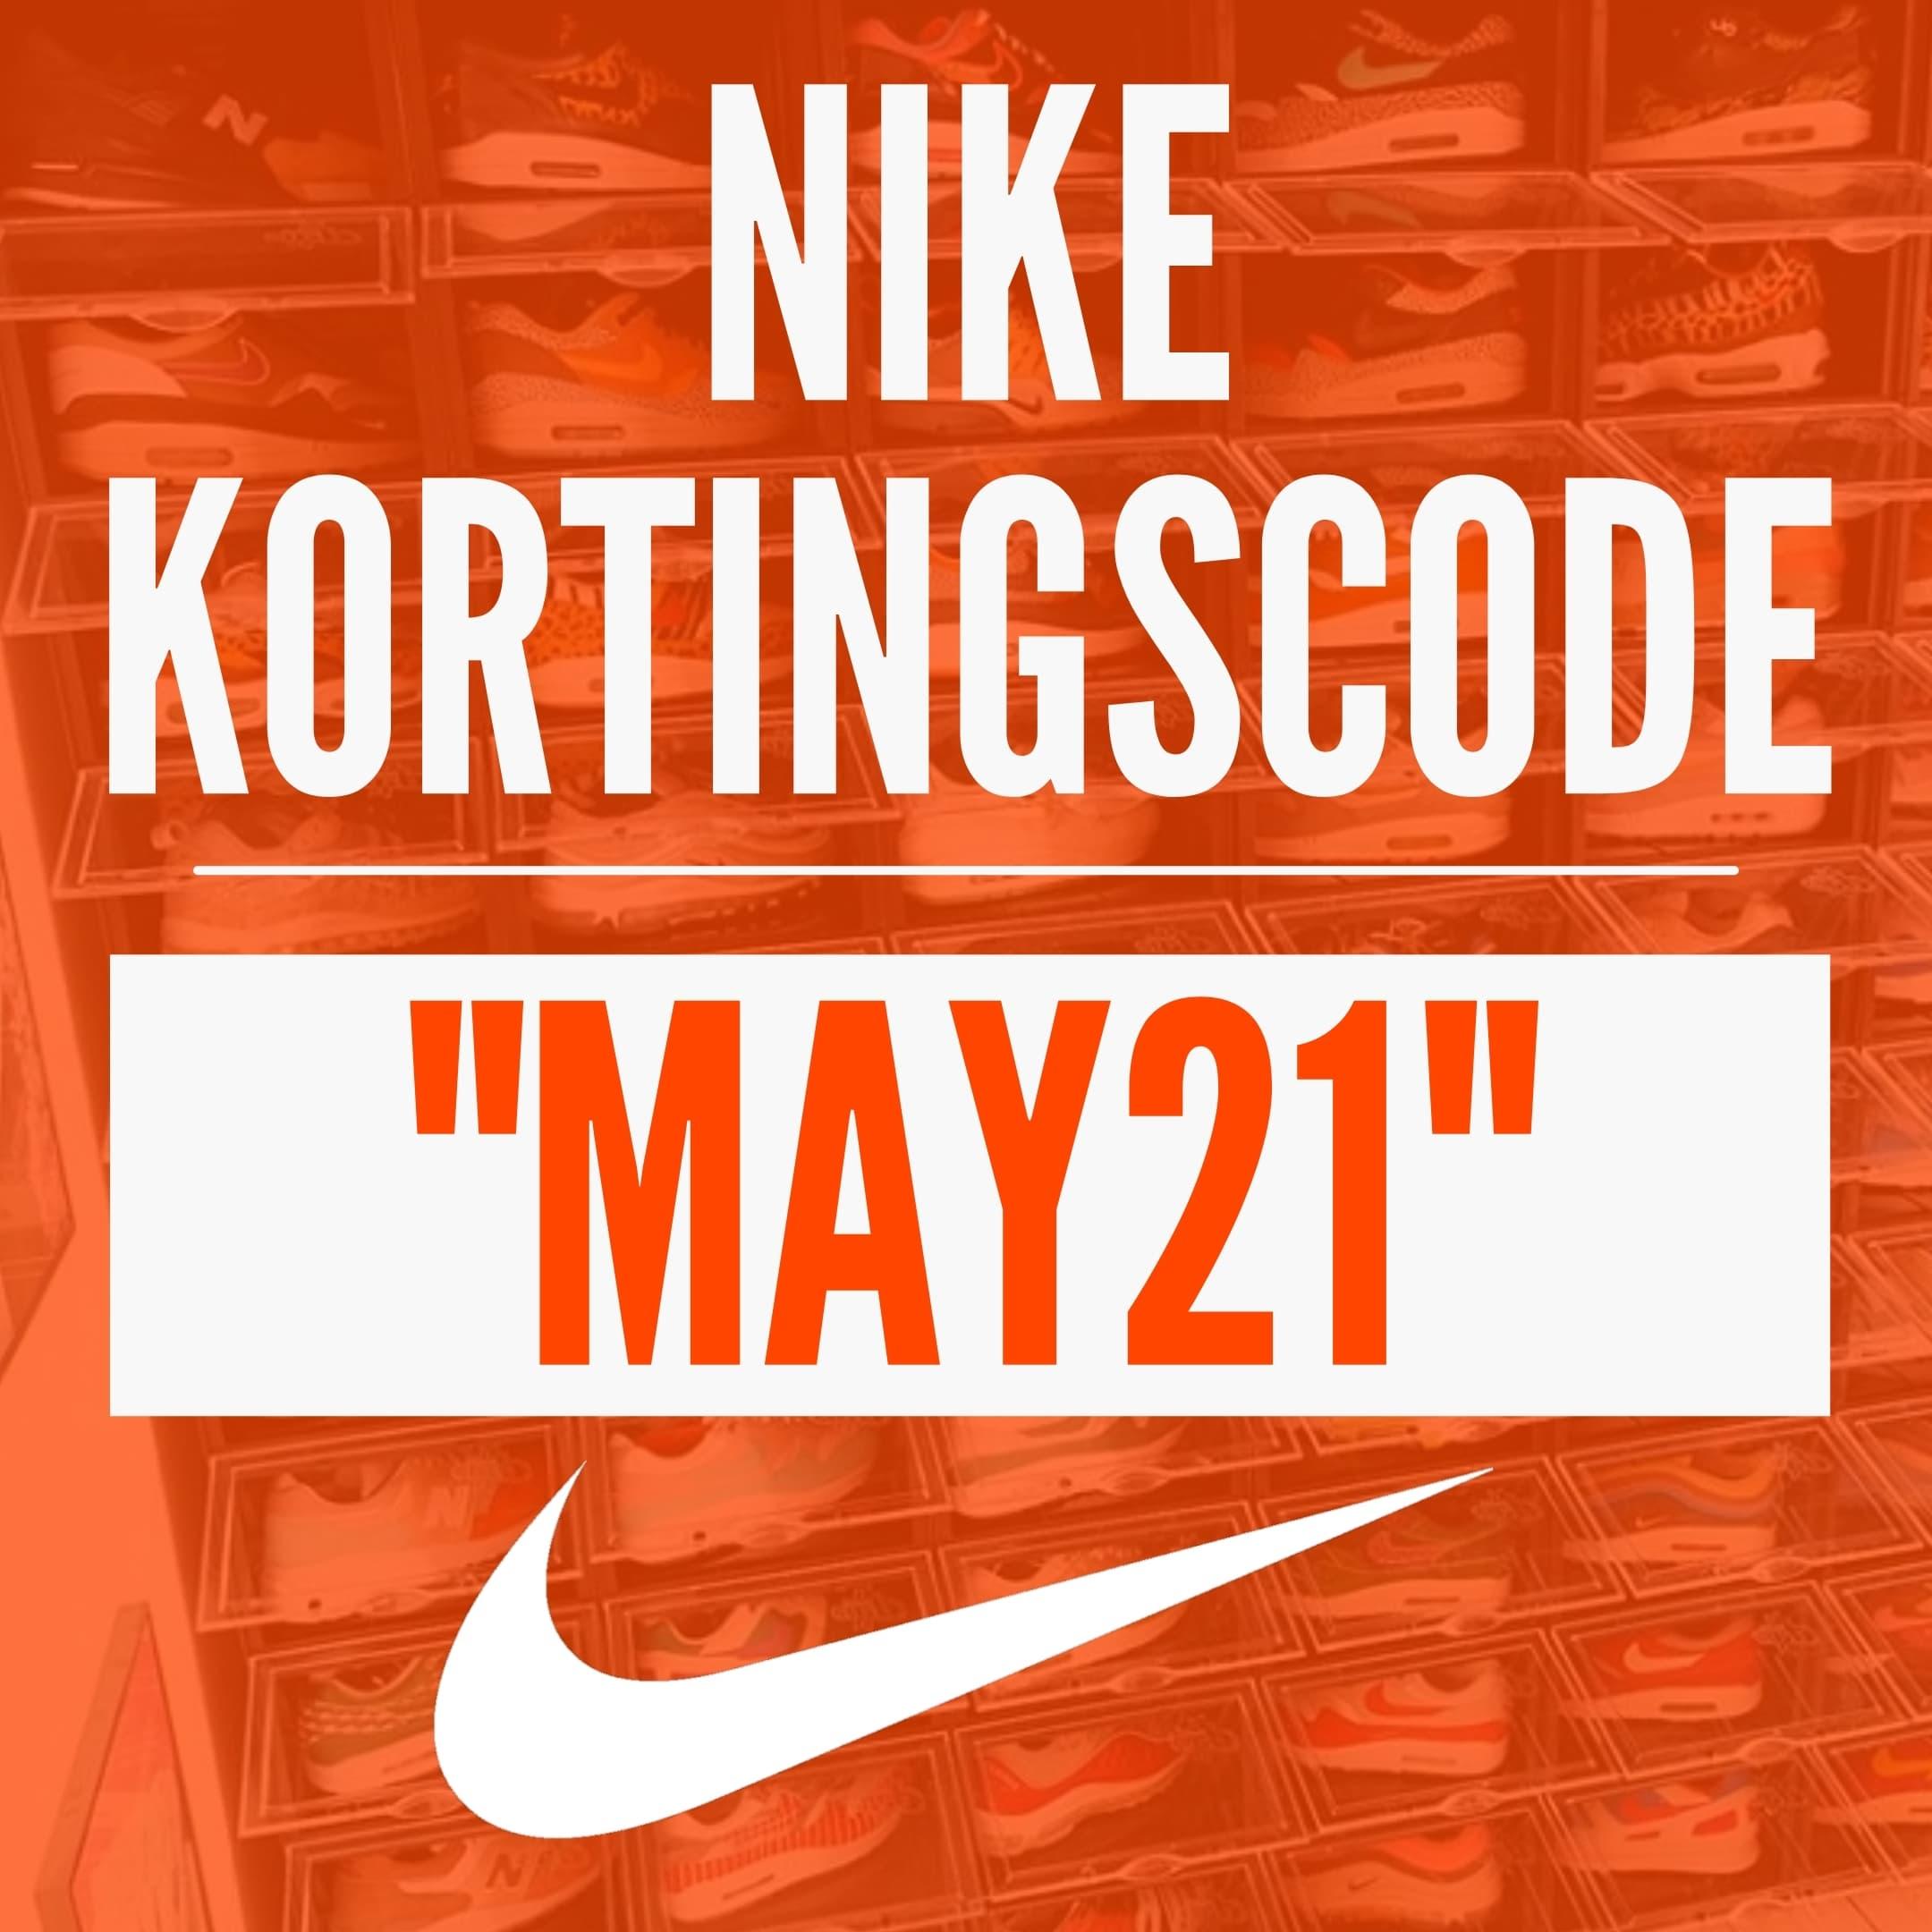 Nike kortingscode MAY21